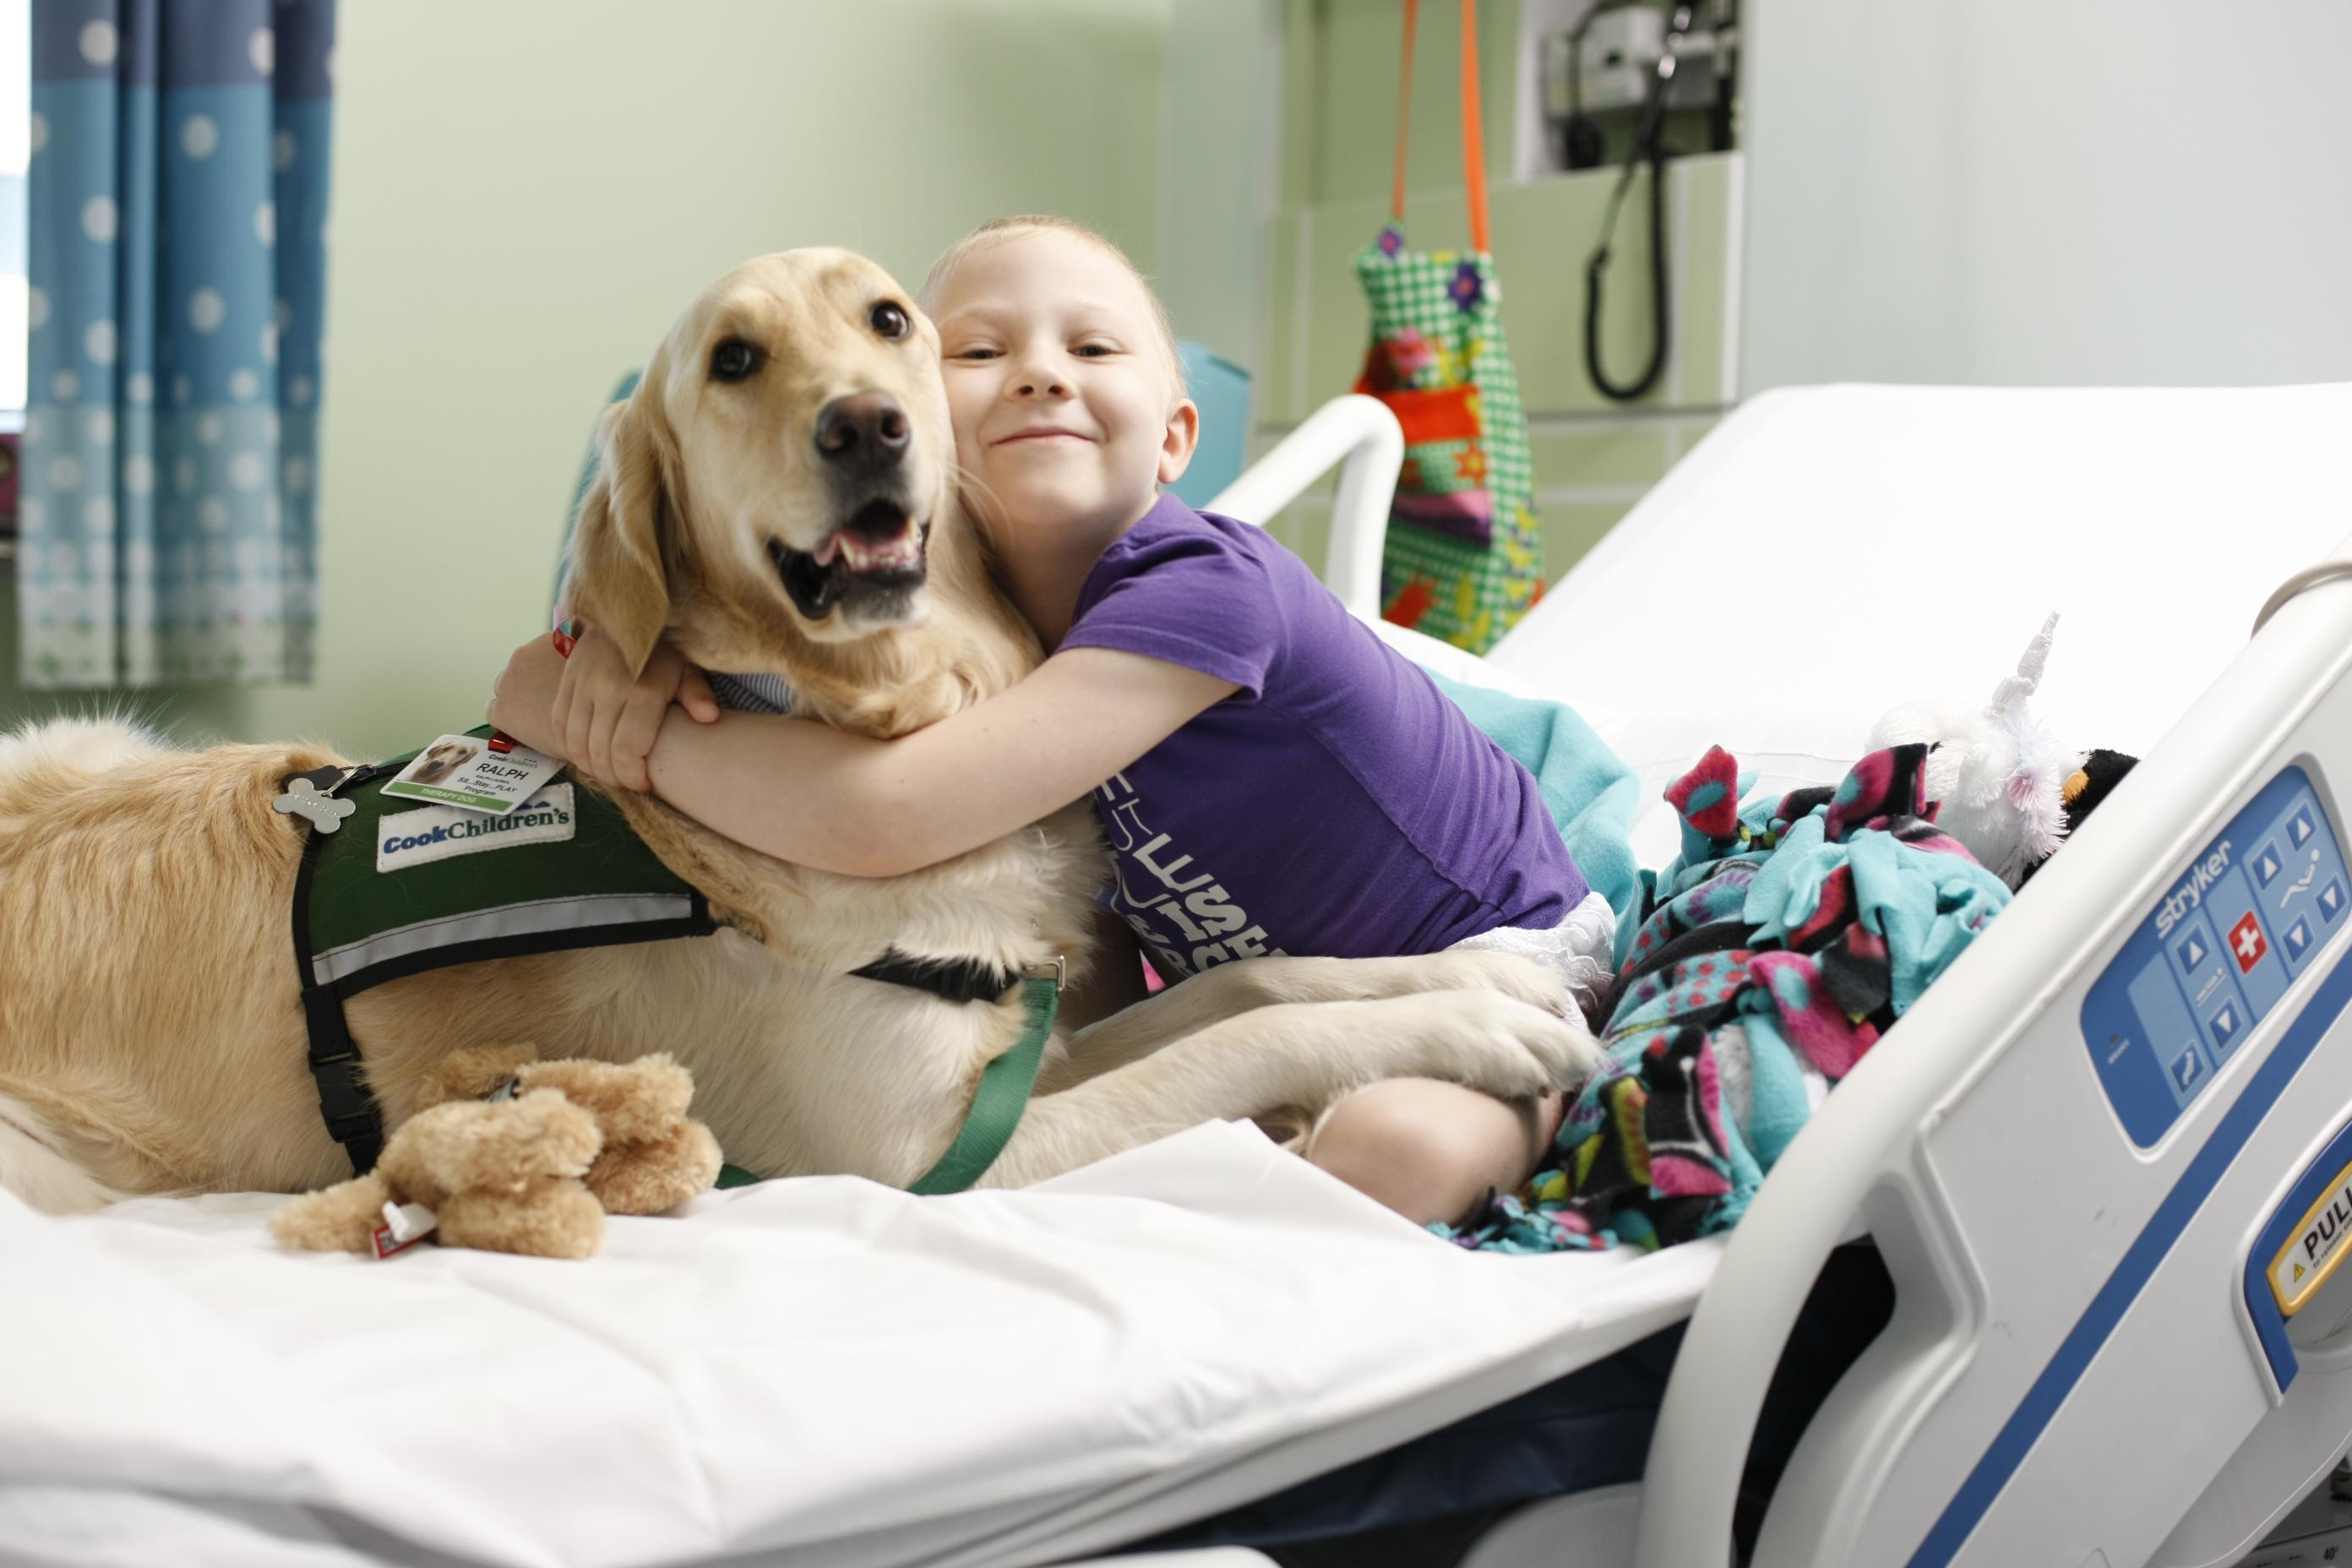 Pets Should Be Treated Like Family